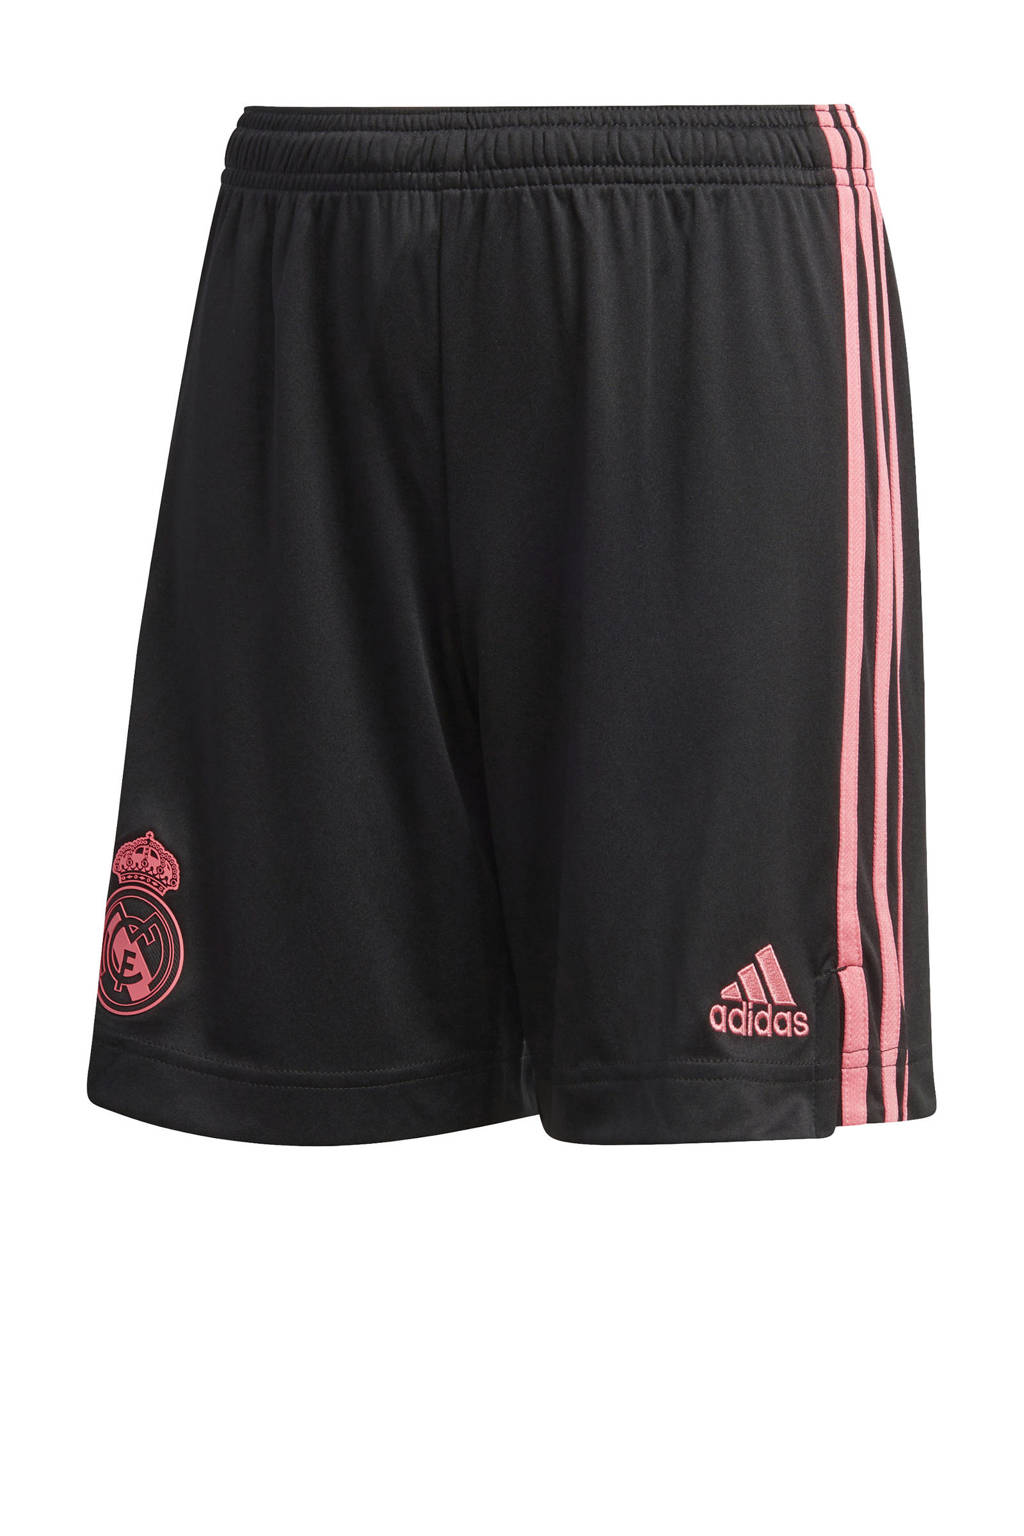 adidas Performance Junior Real Madrid voetbalshort zwart/roze, Zwart/roze